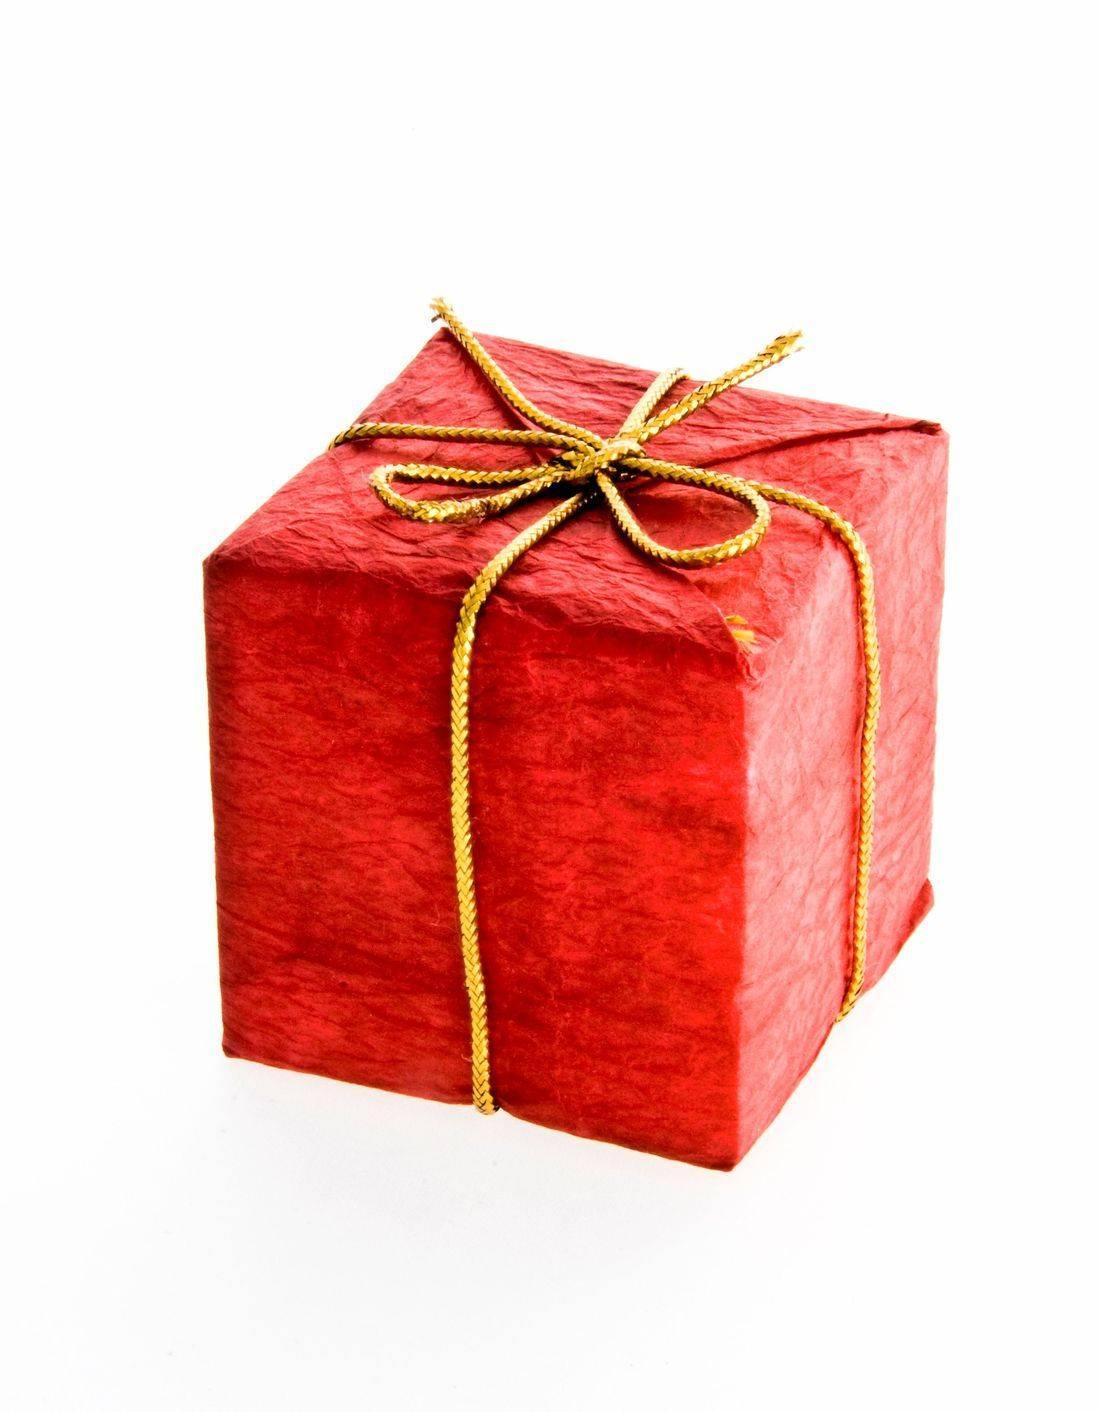 gift voucher for beauty treatments: facial, massage